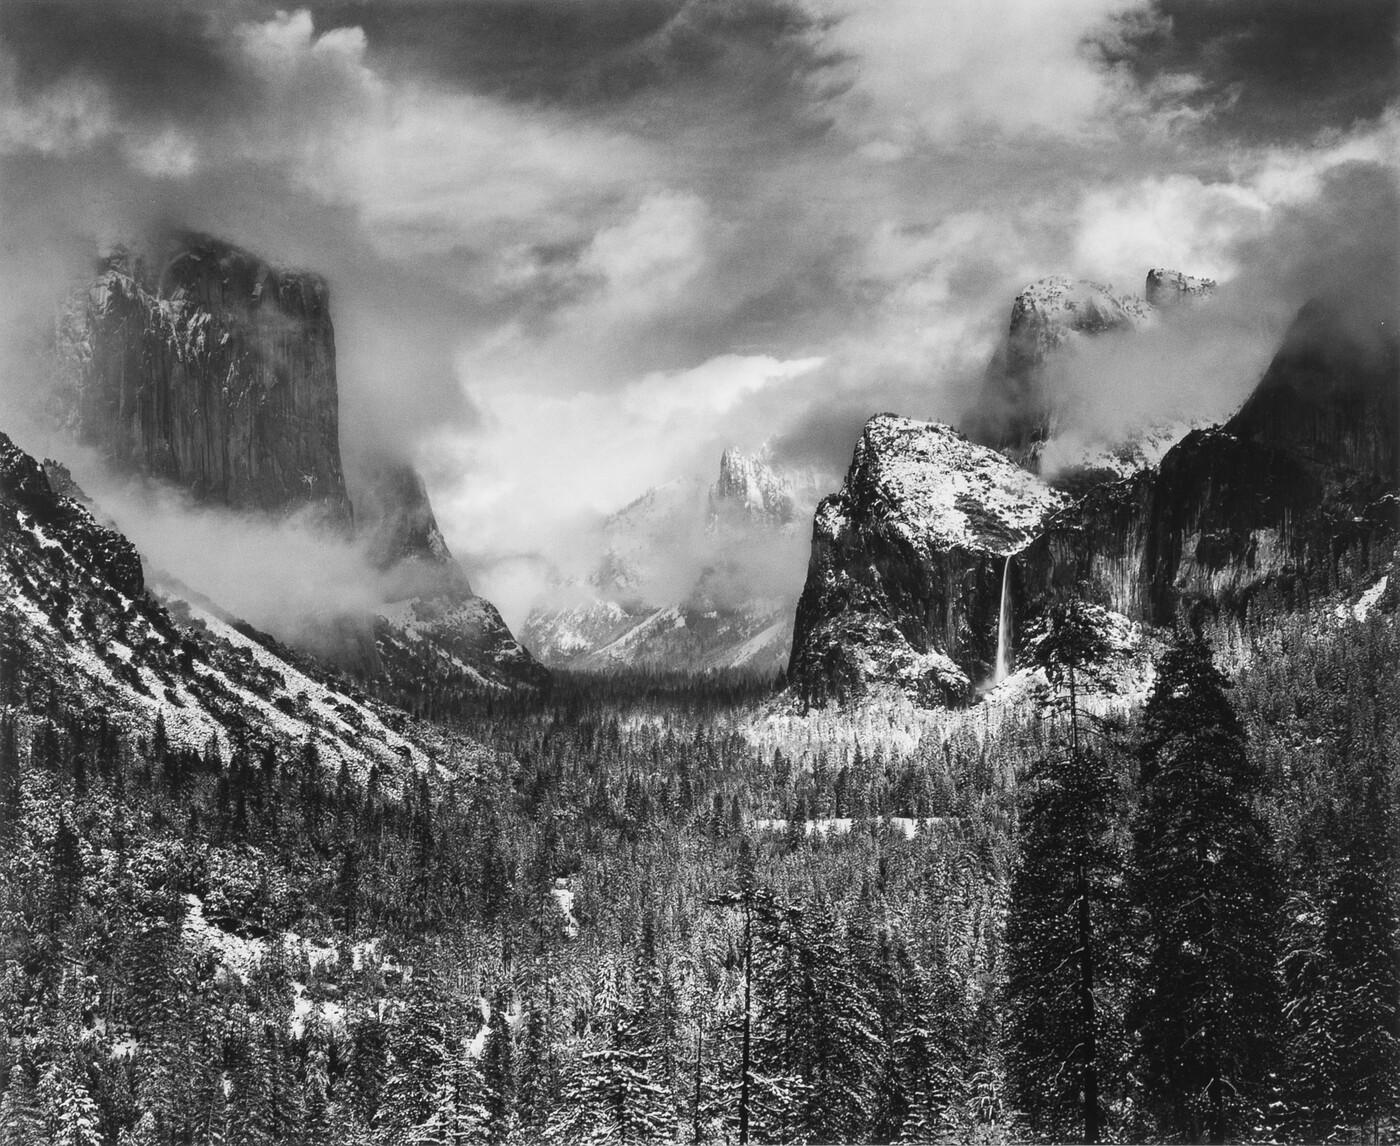 Ansel Adams (1902–1984), Clearing Winter Storm, Yosemite National Park, before 1975, Gelatin silver print